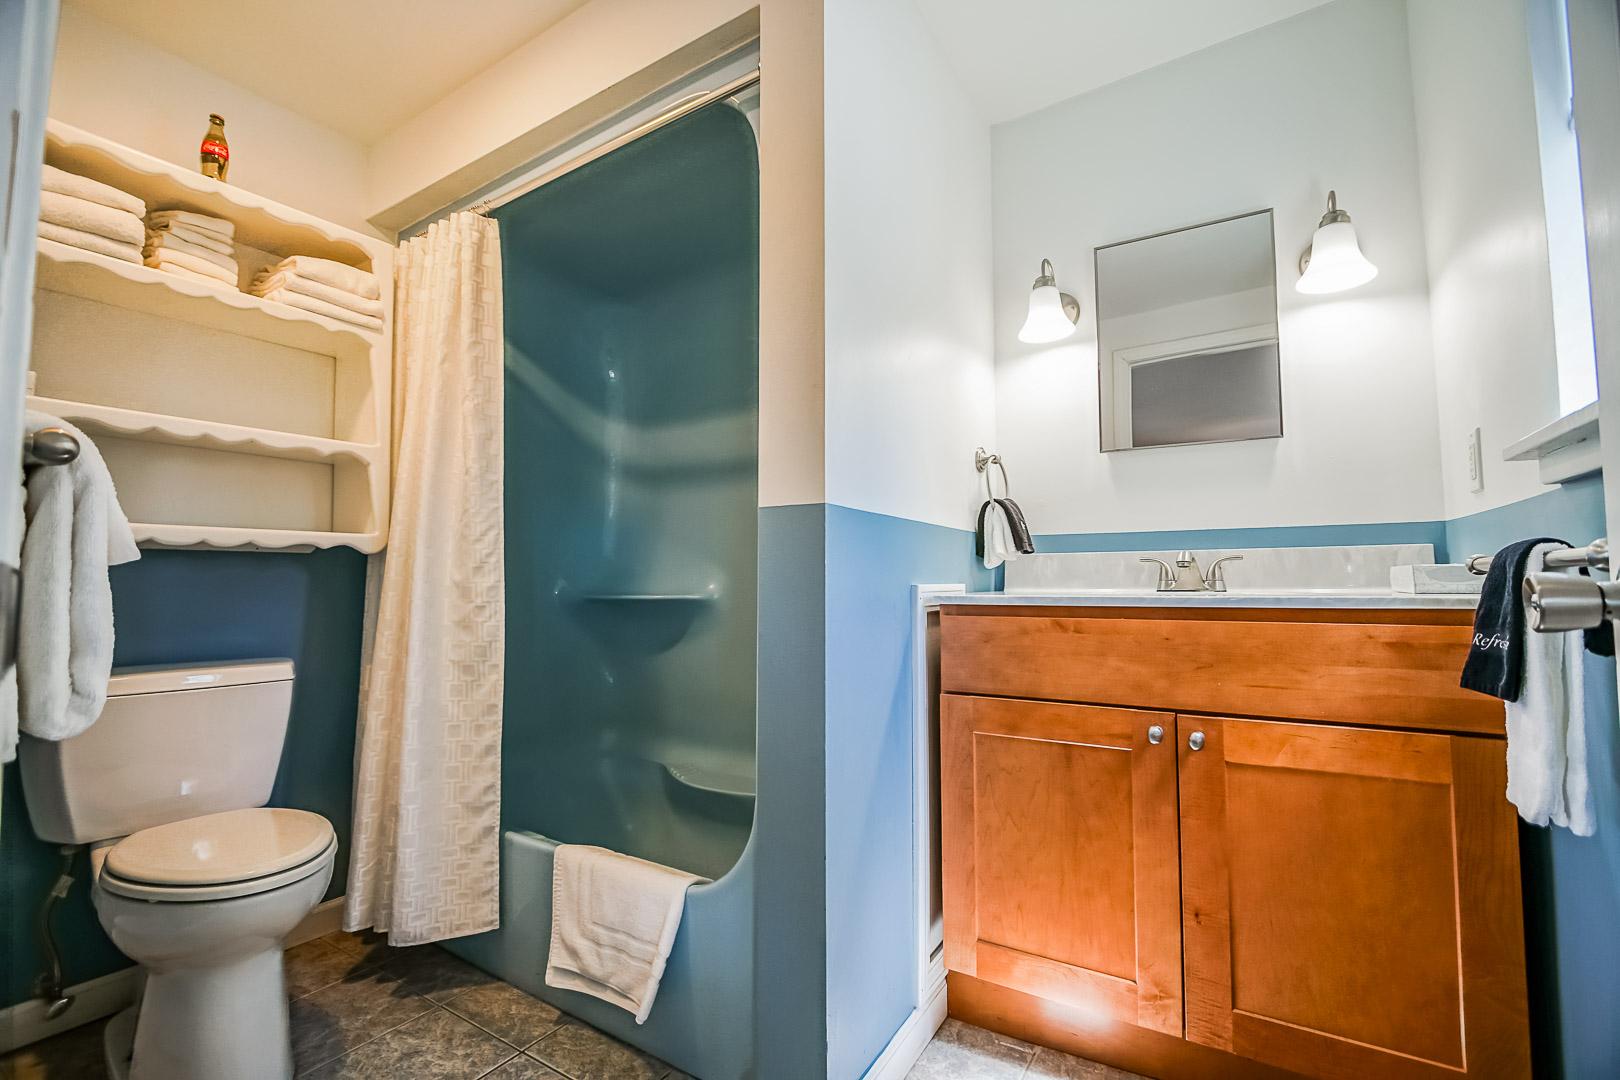 A cozy bathroom  at VRI's Neptune House Resort in Rhode Island.